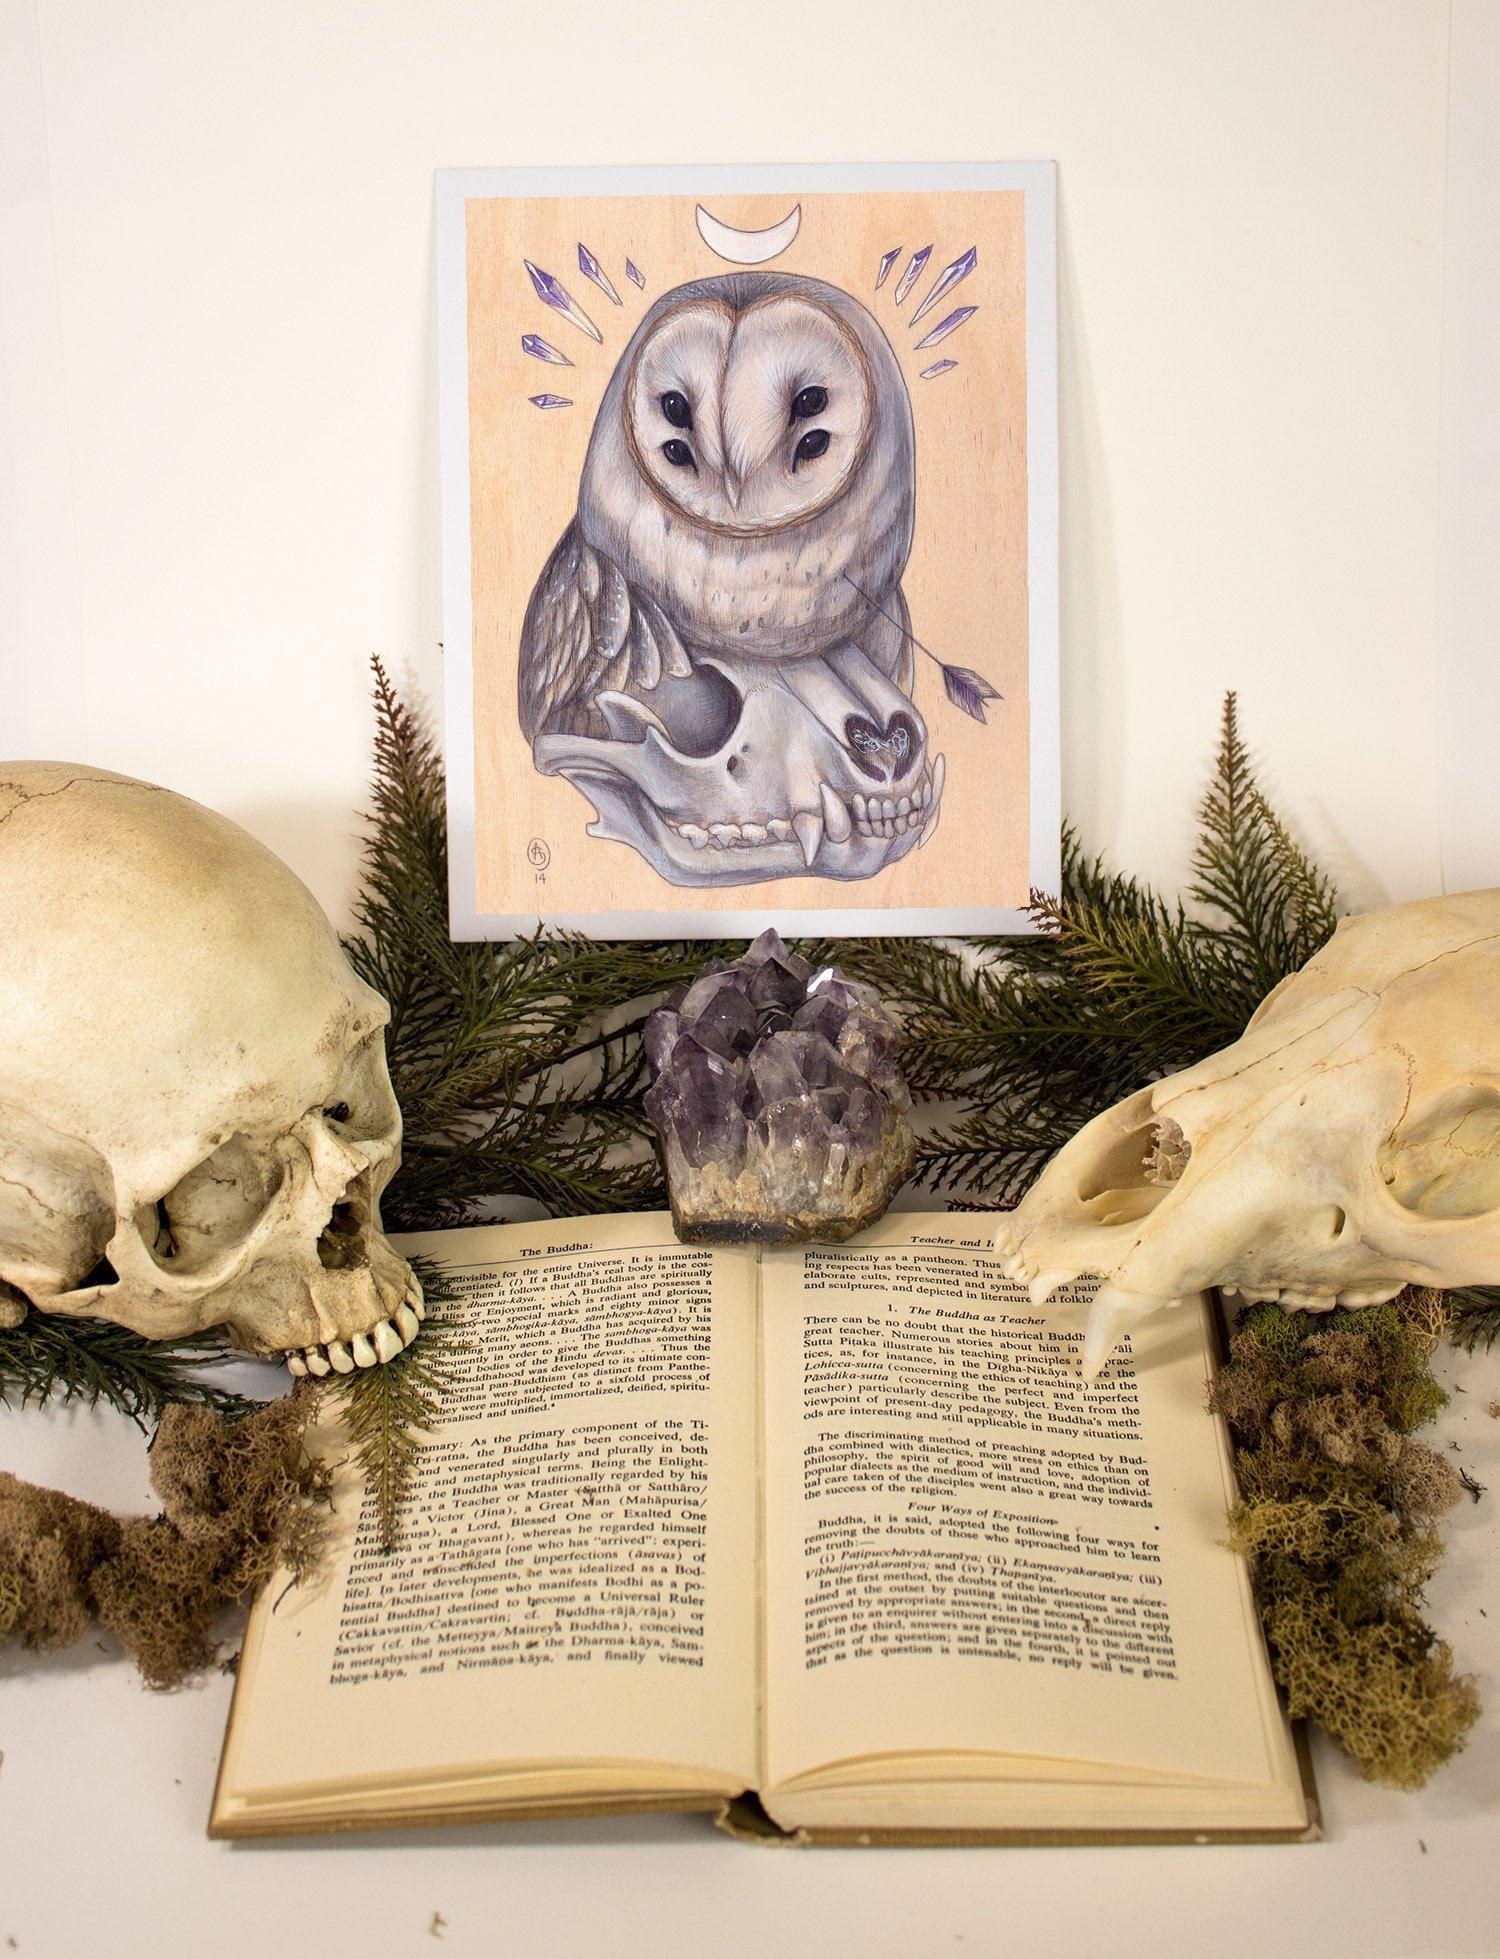 SALE Barn Owl Raccoon Skull Archery Macabre PRINT | Etsy